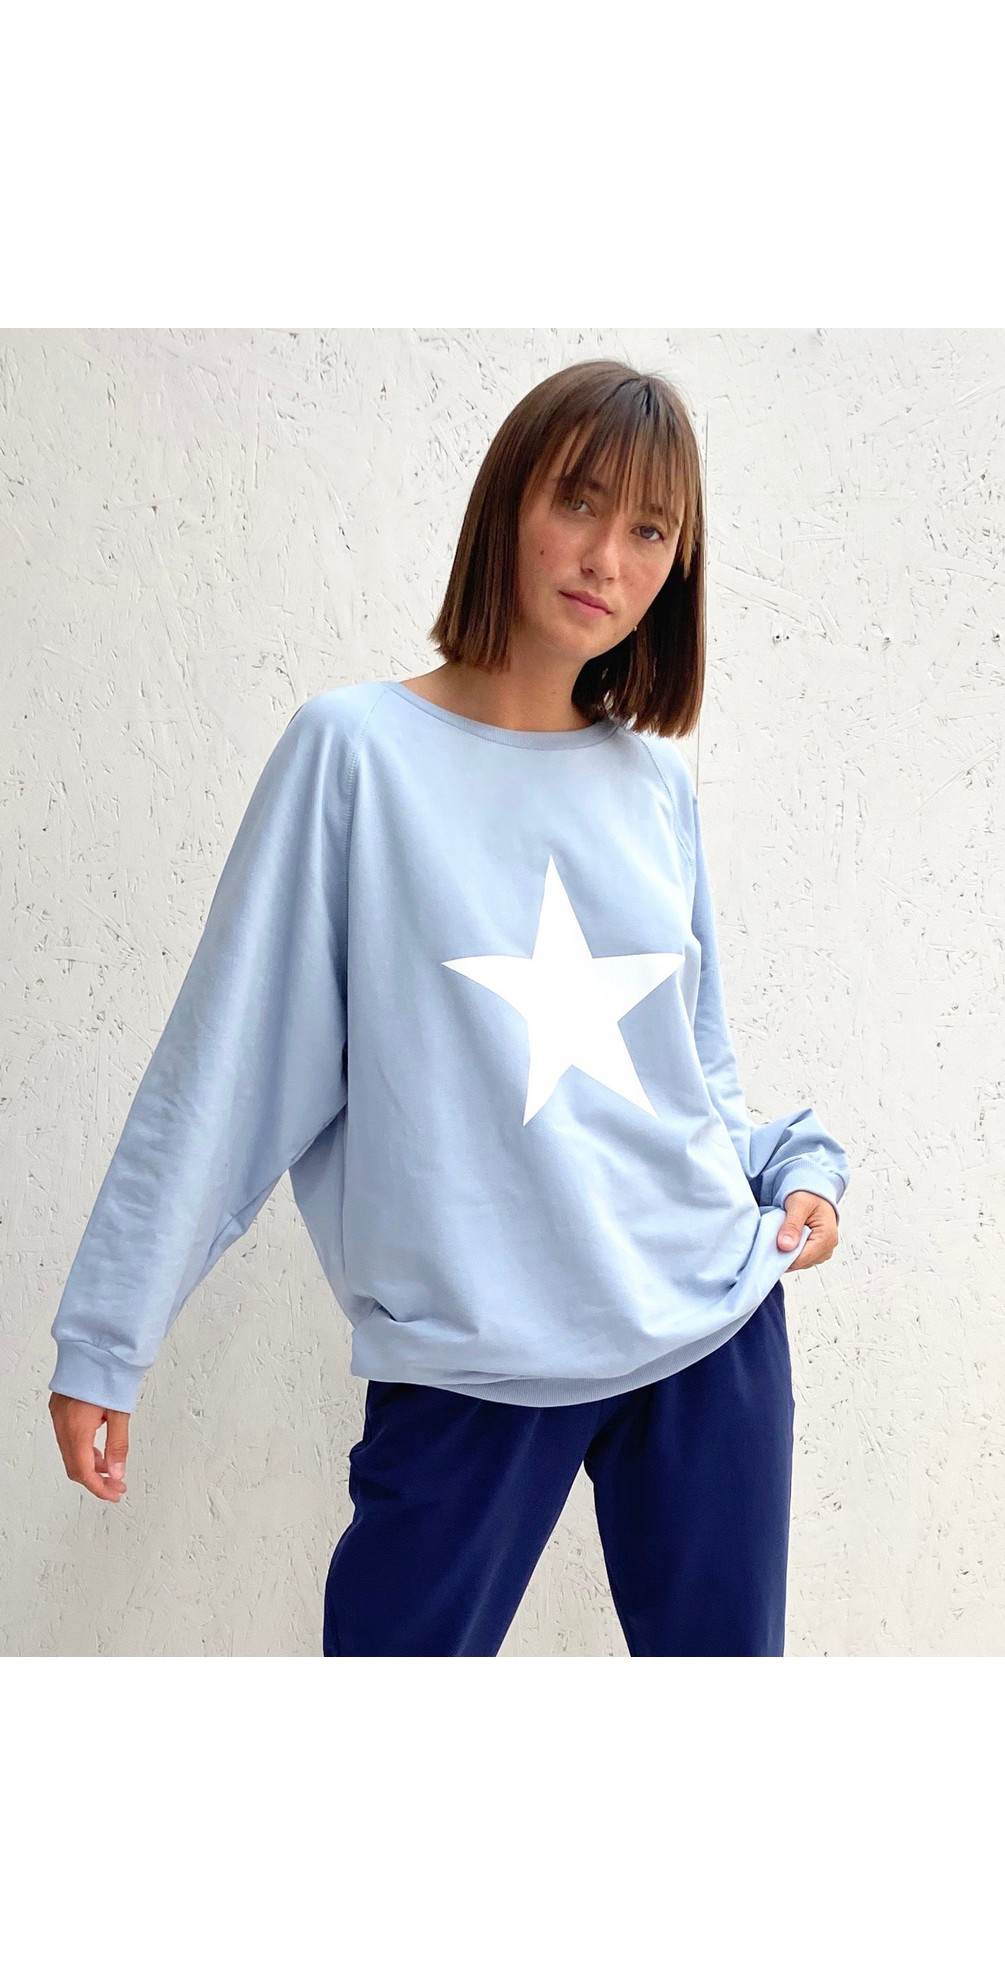 Nancy Star Oversized Comfy Sweatshirt main image